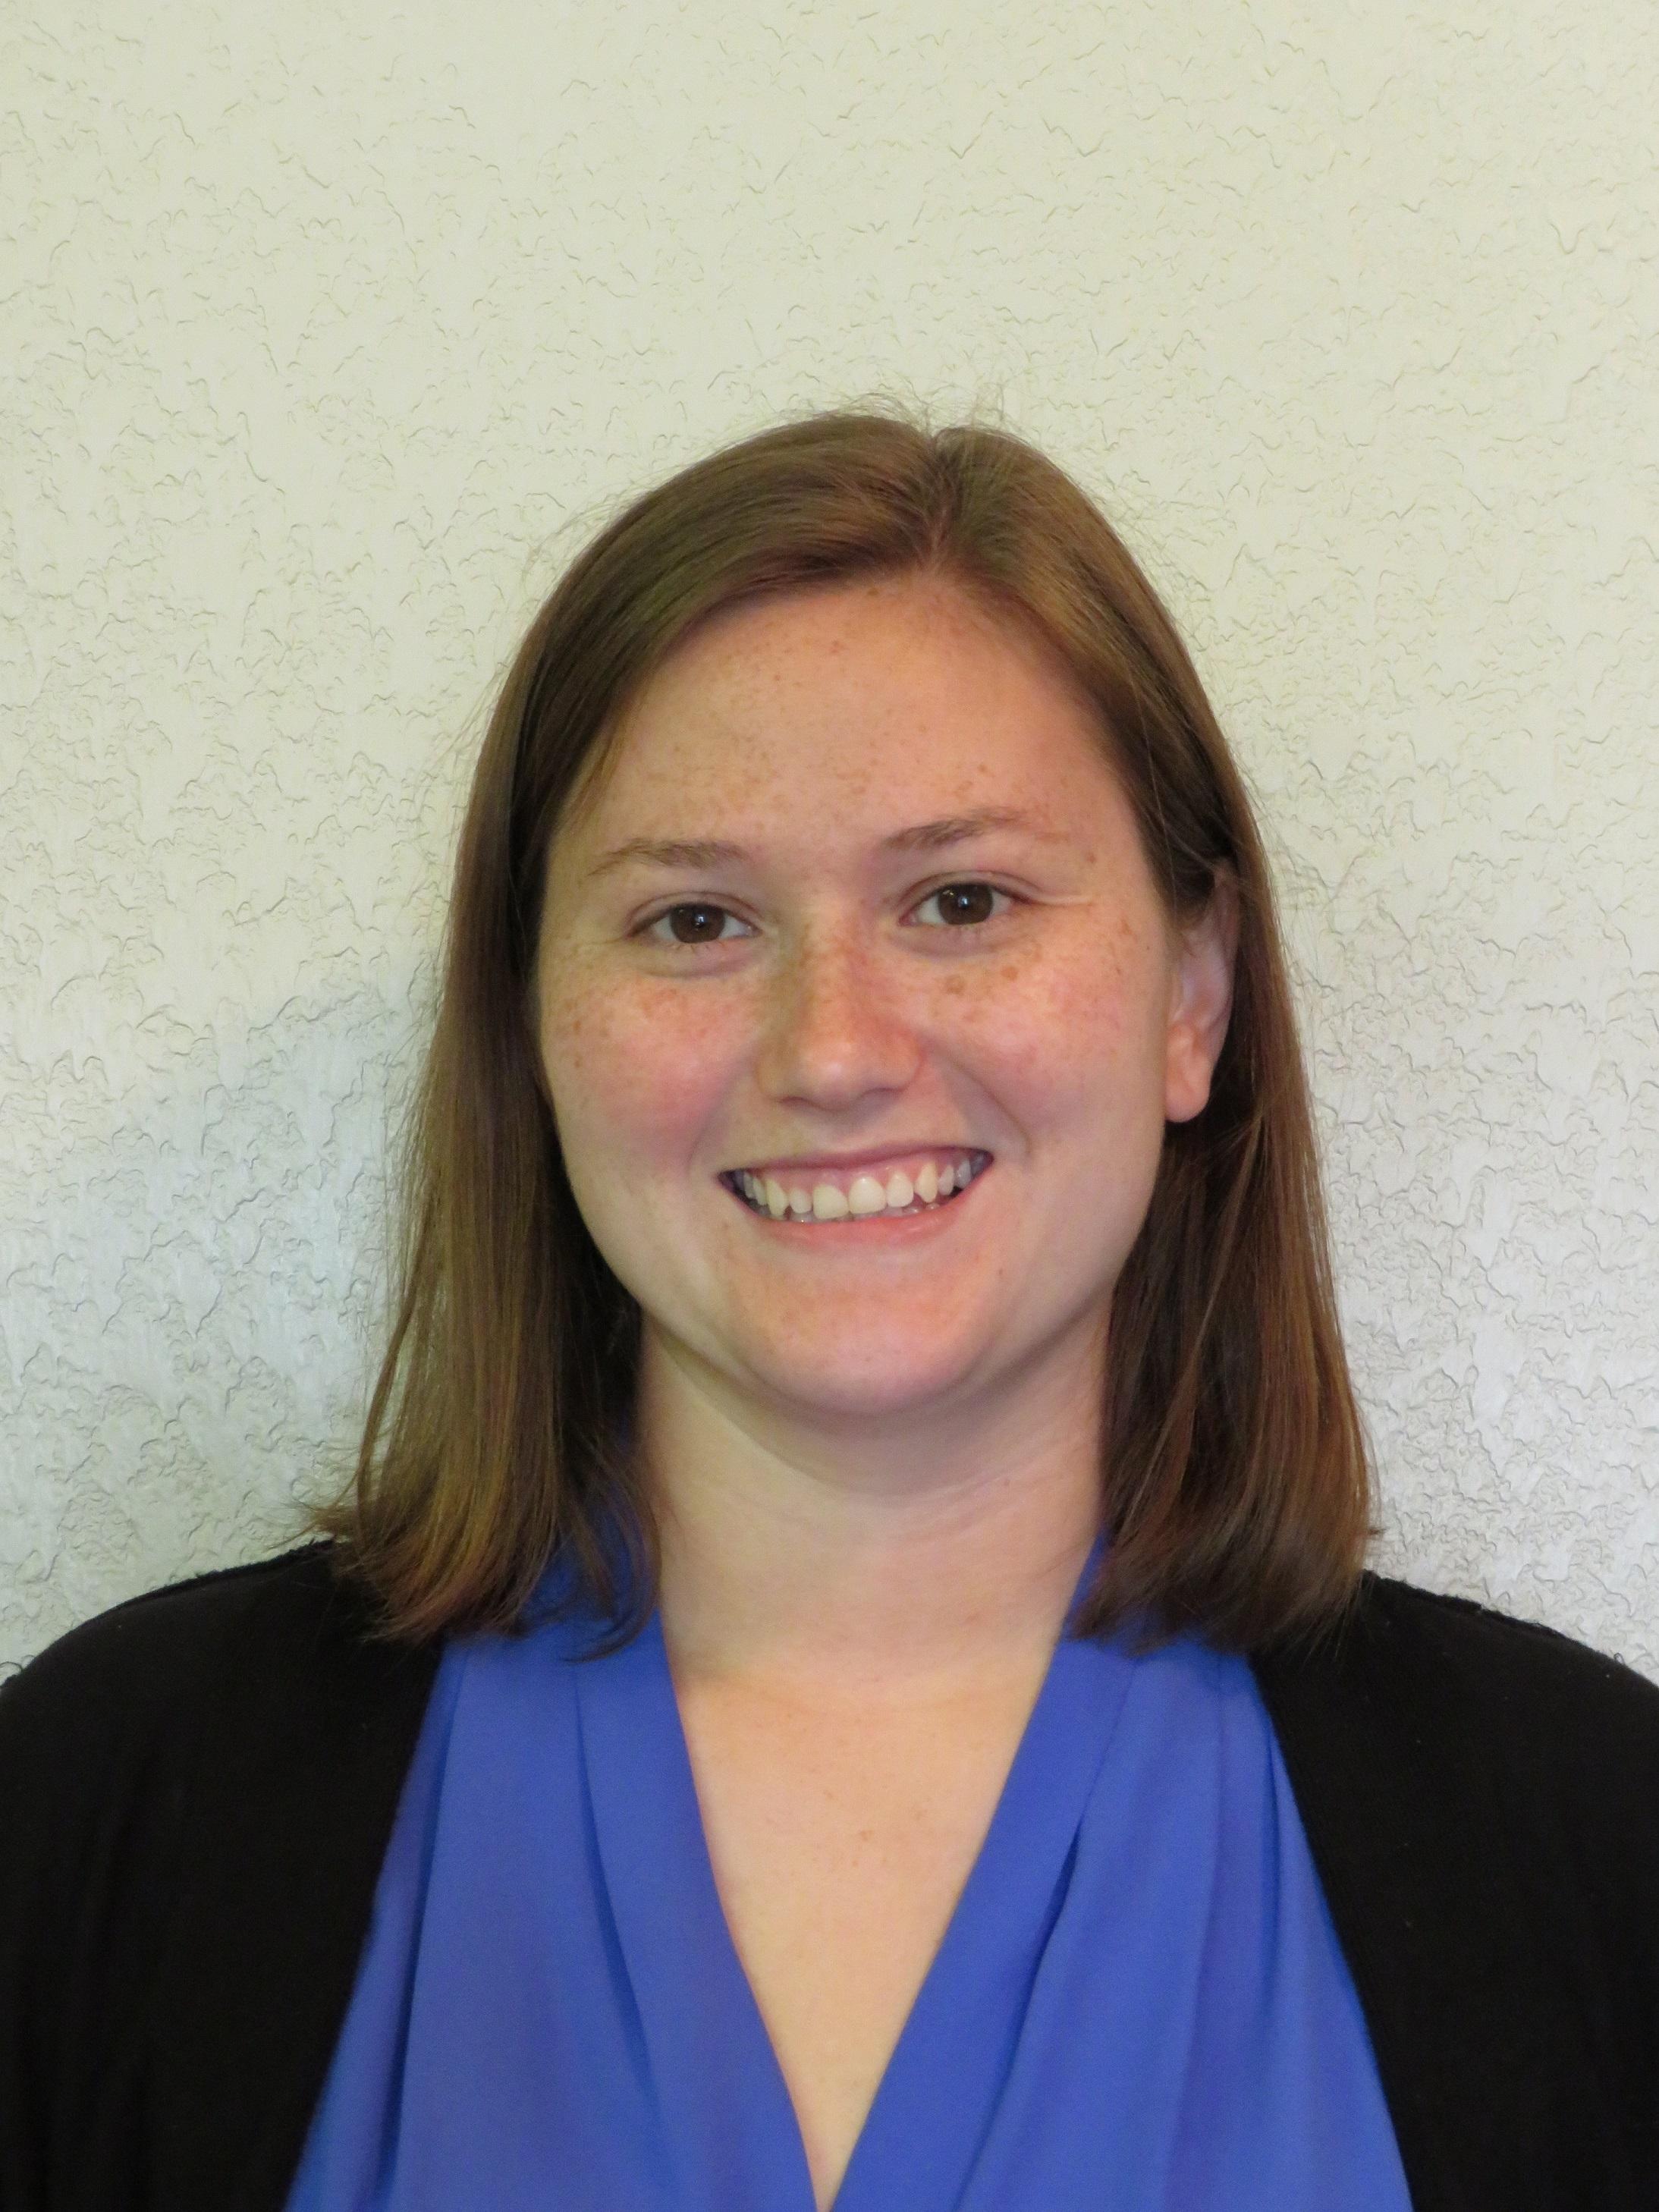 Sarah C. Clayton